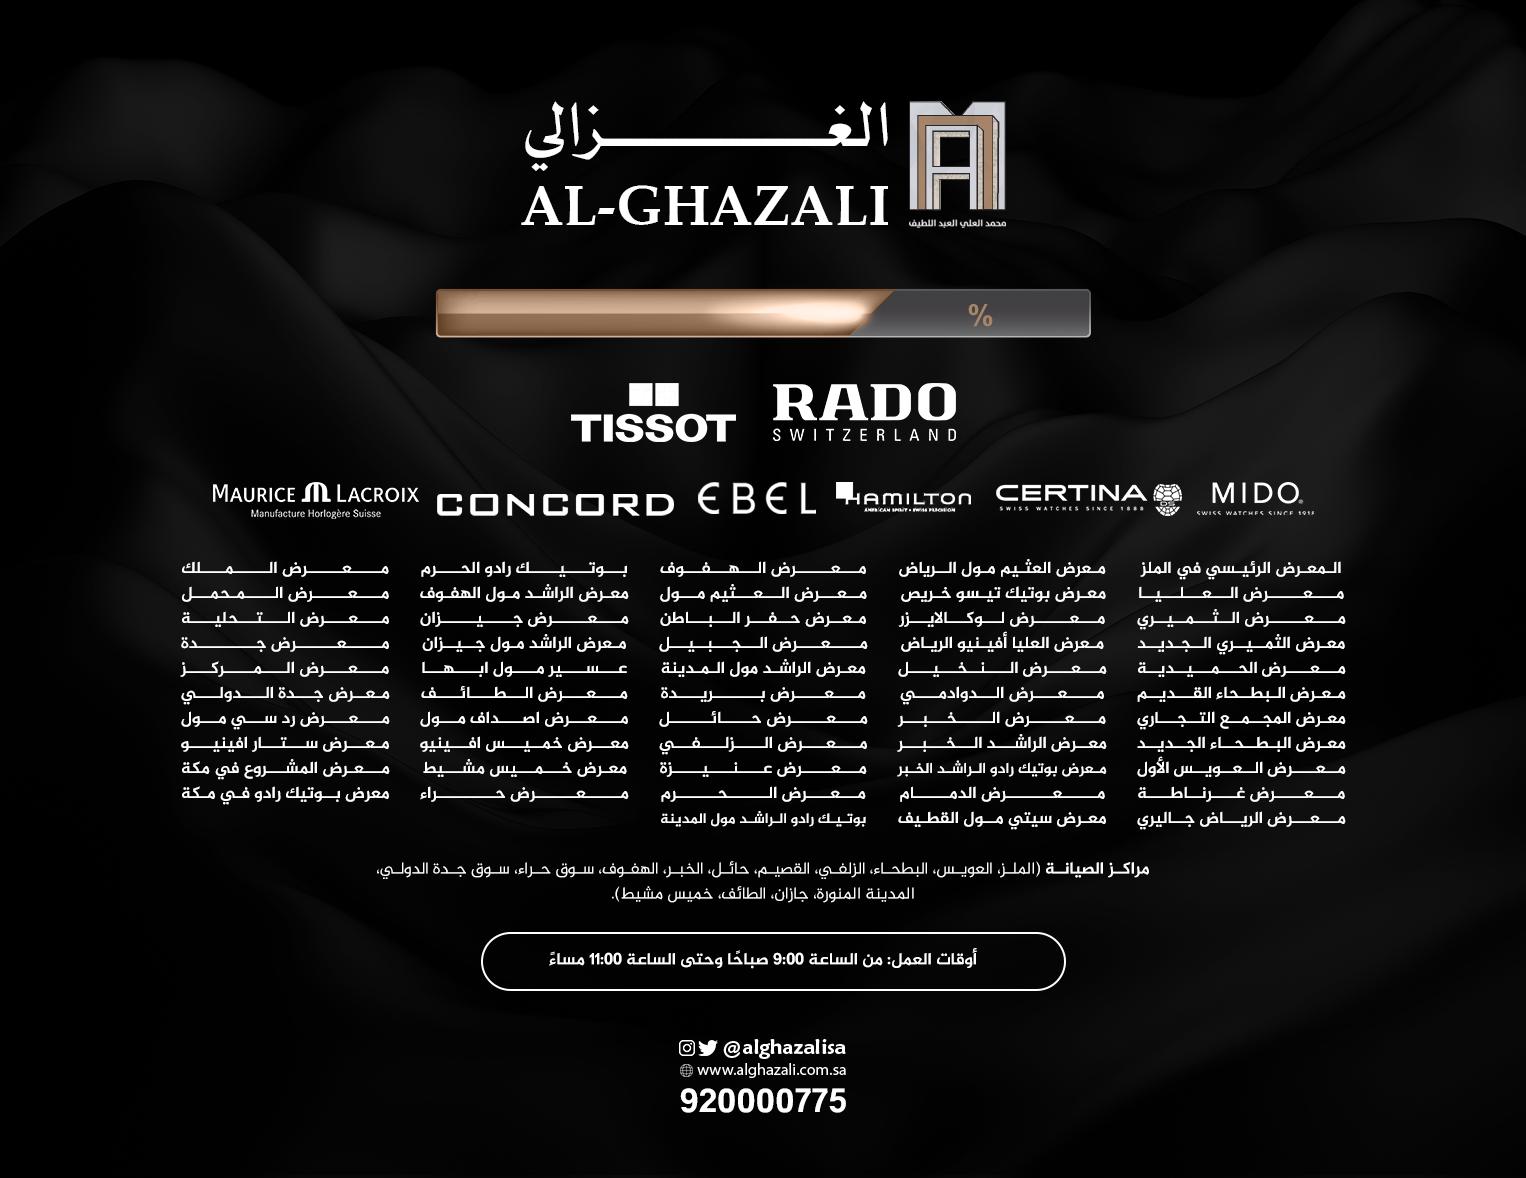 Alghazali Group